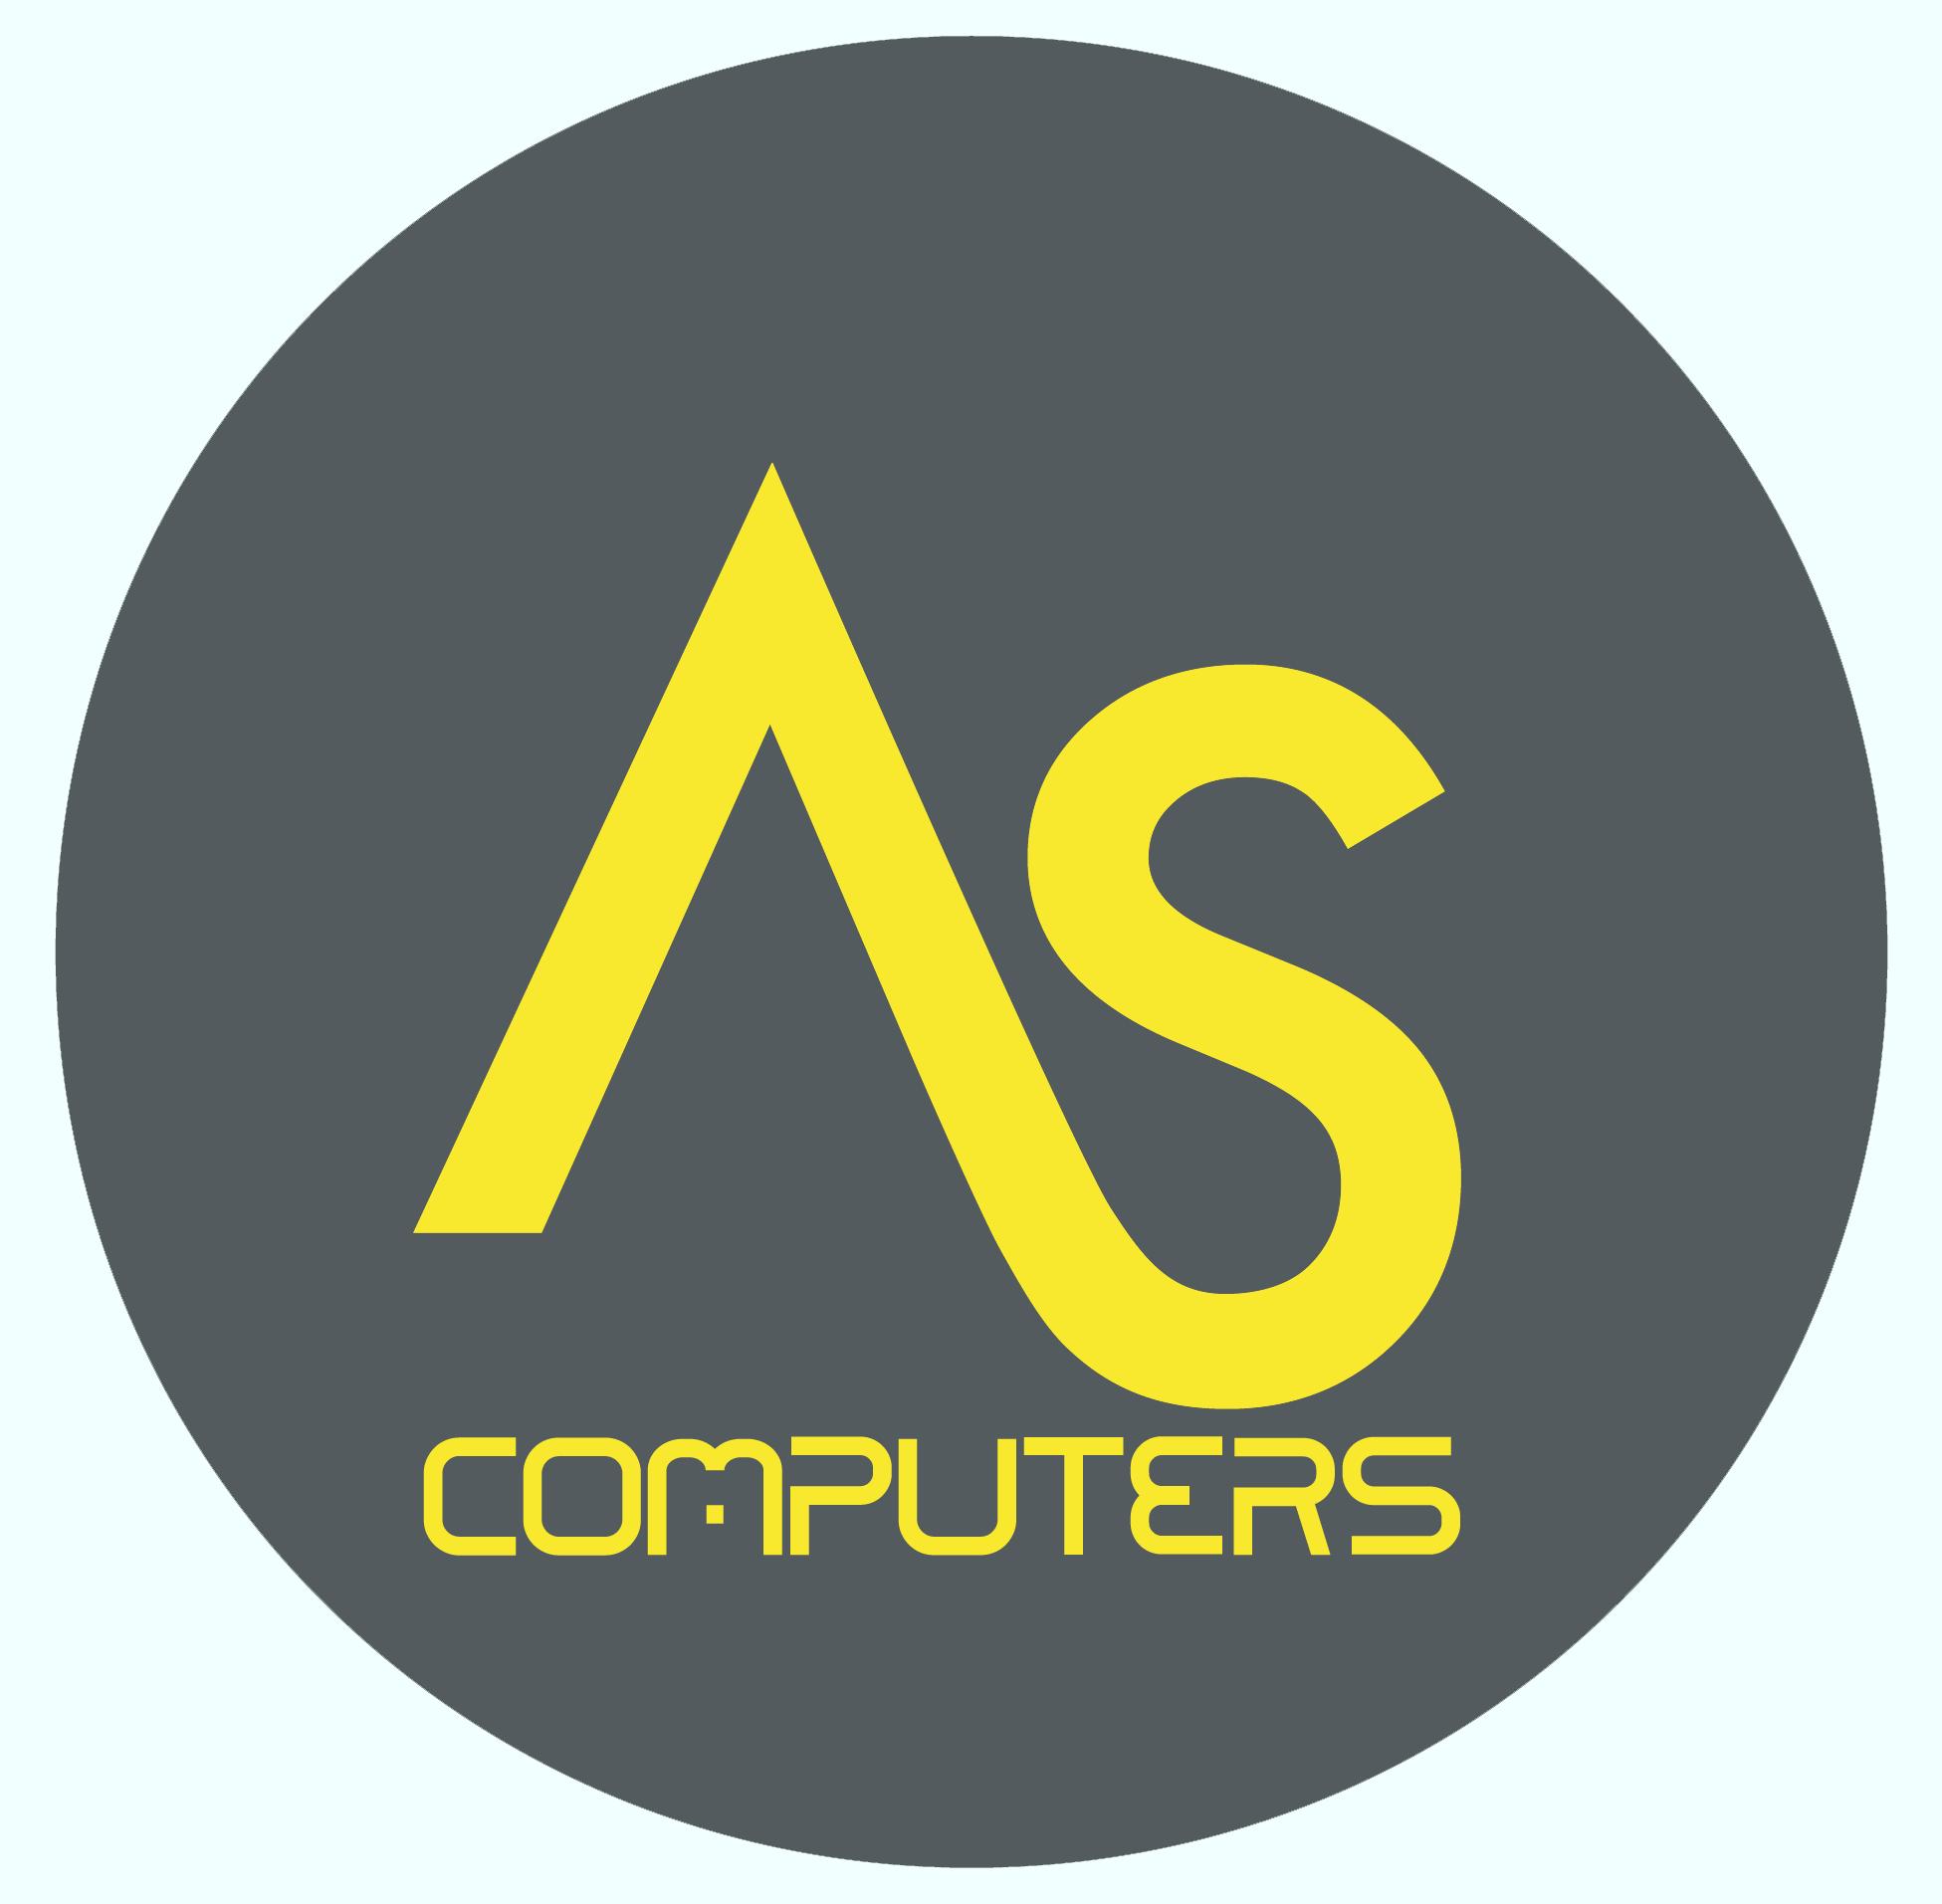 A.S Computer